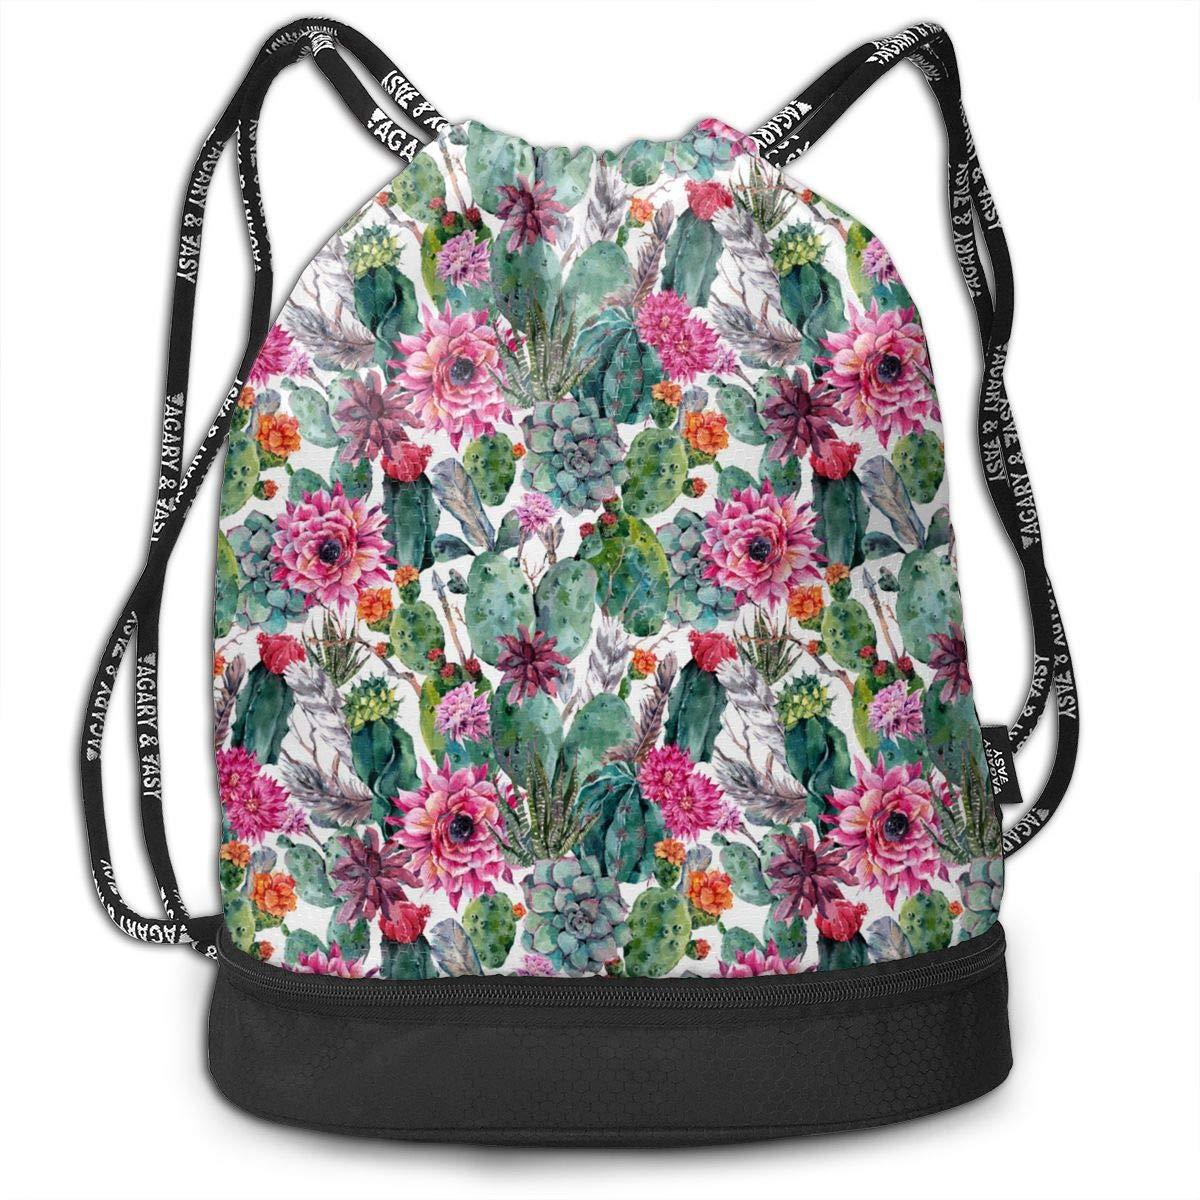 Cool Drawstring Backpack Cactus Print Drawstring Backpack Rucksack Shoulder Bags Gym Bag